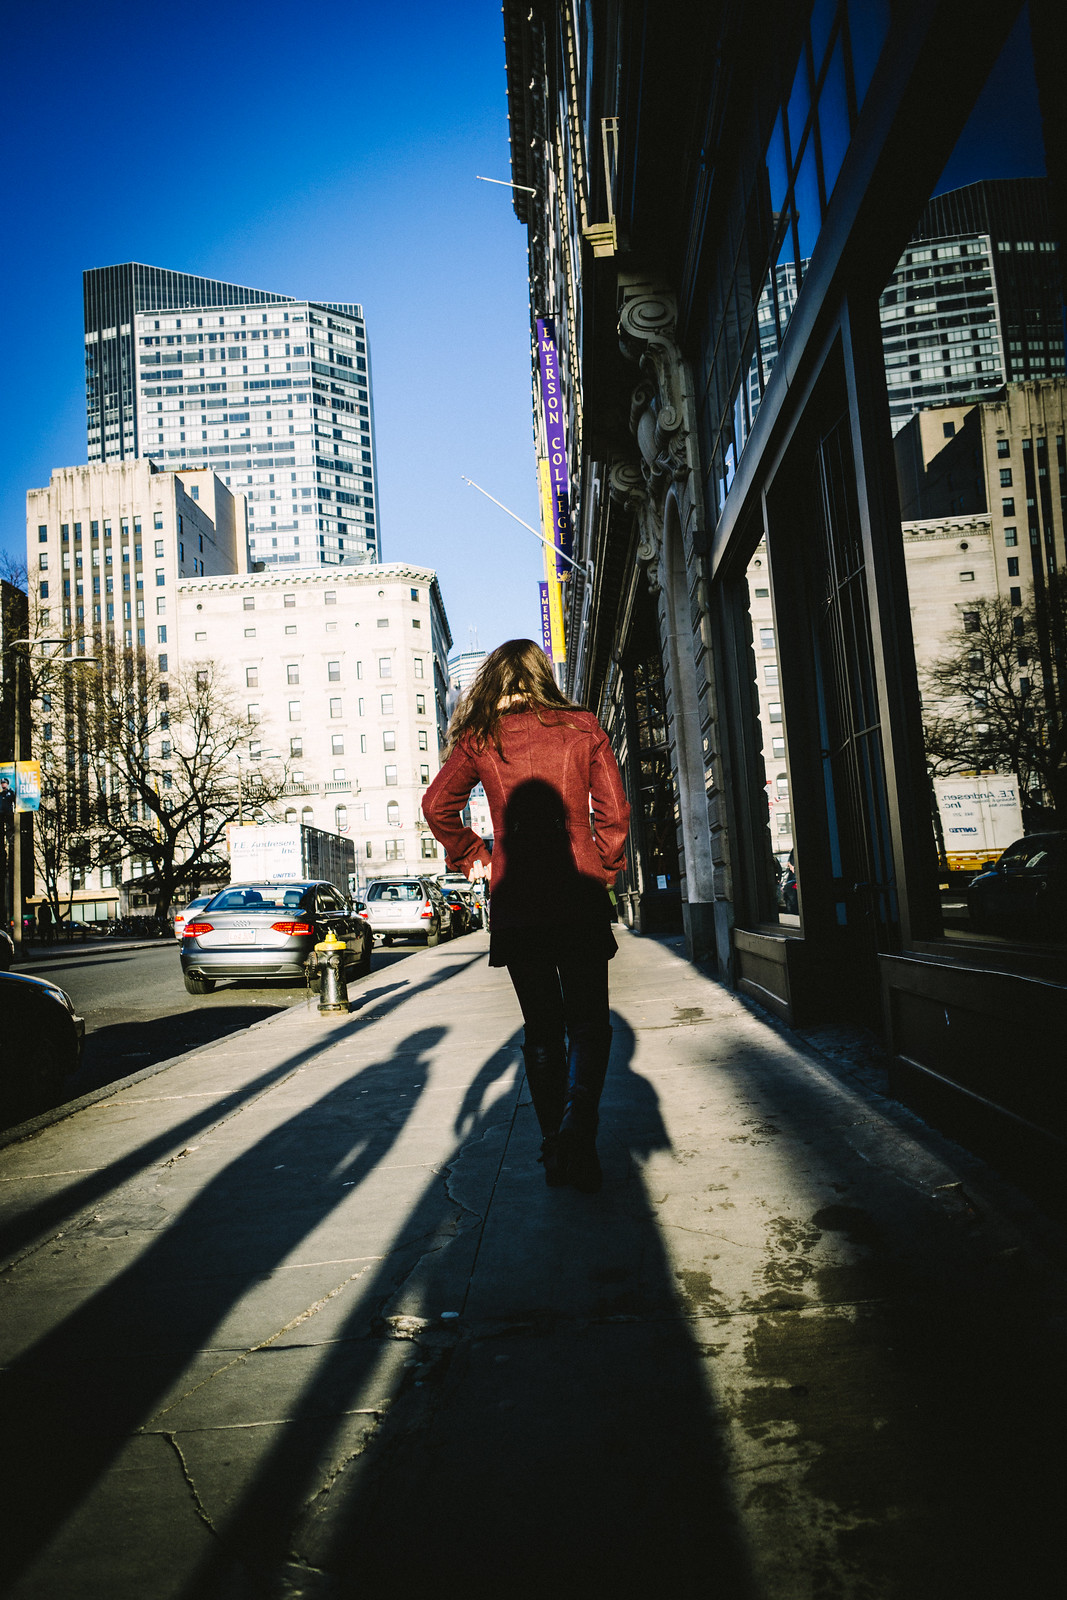 Street Walking in Shadows